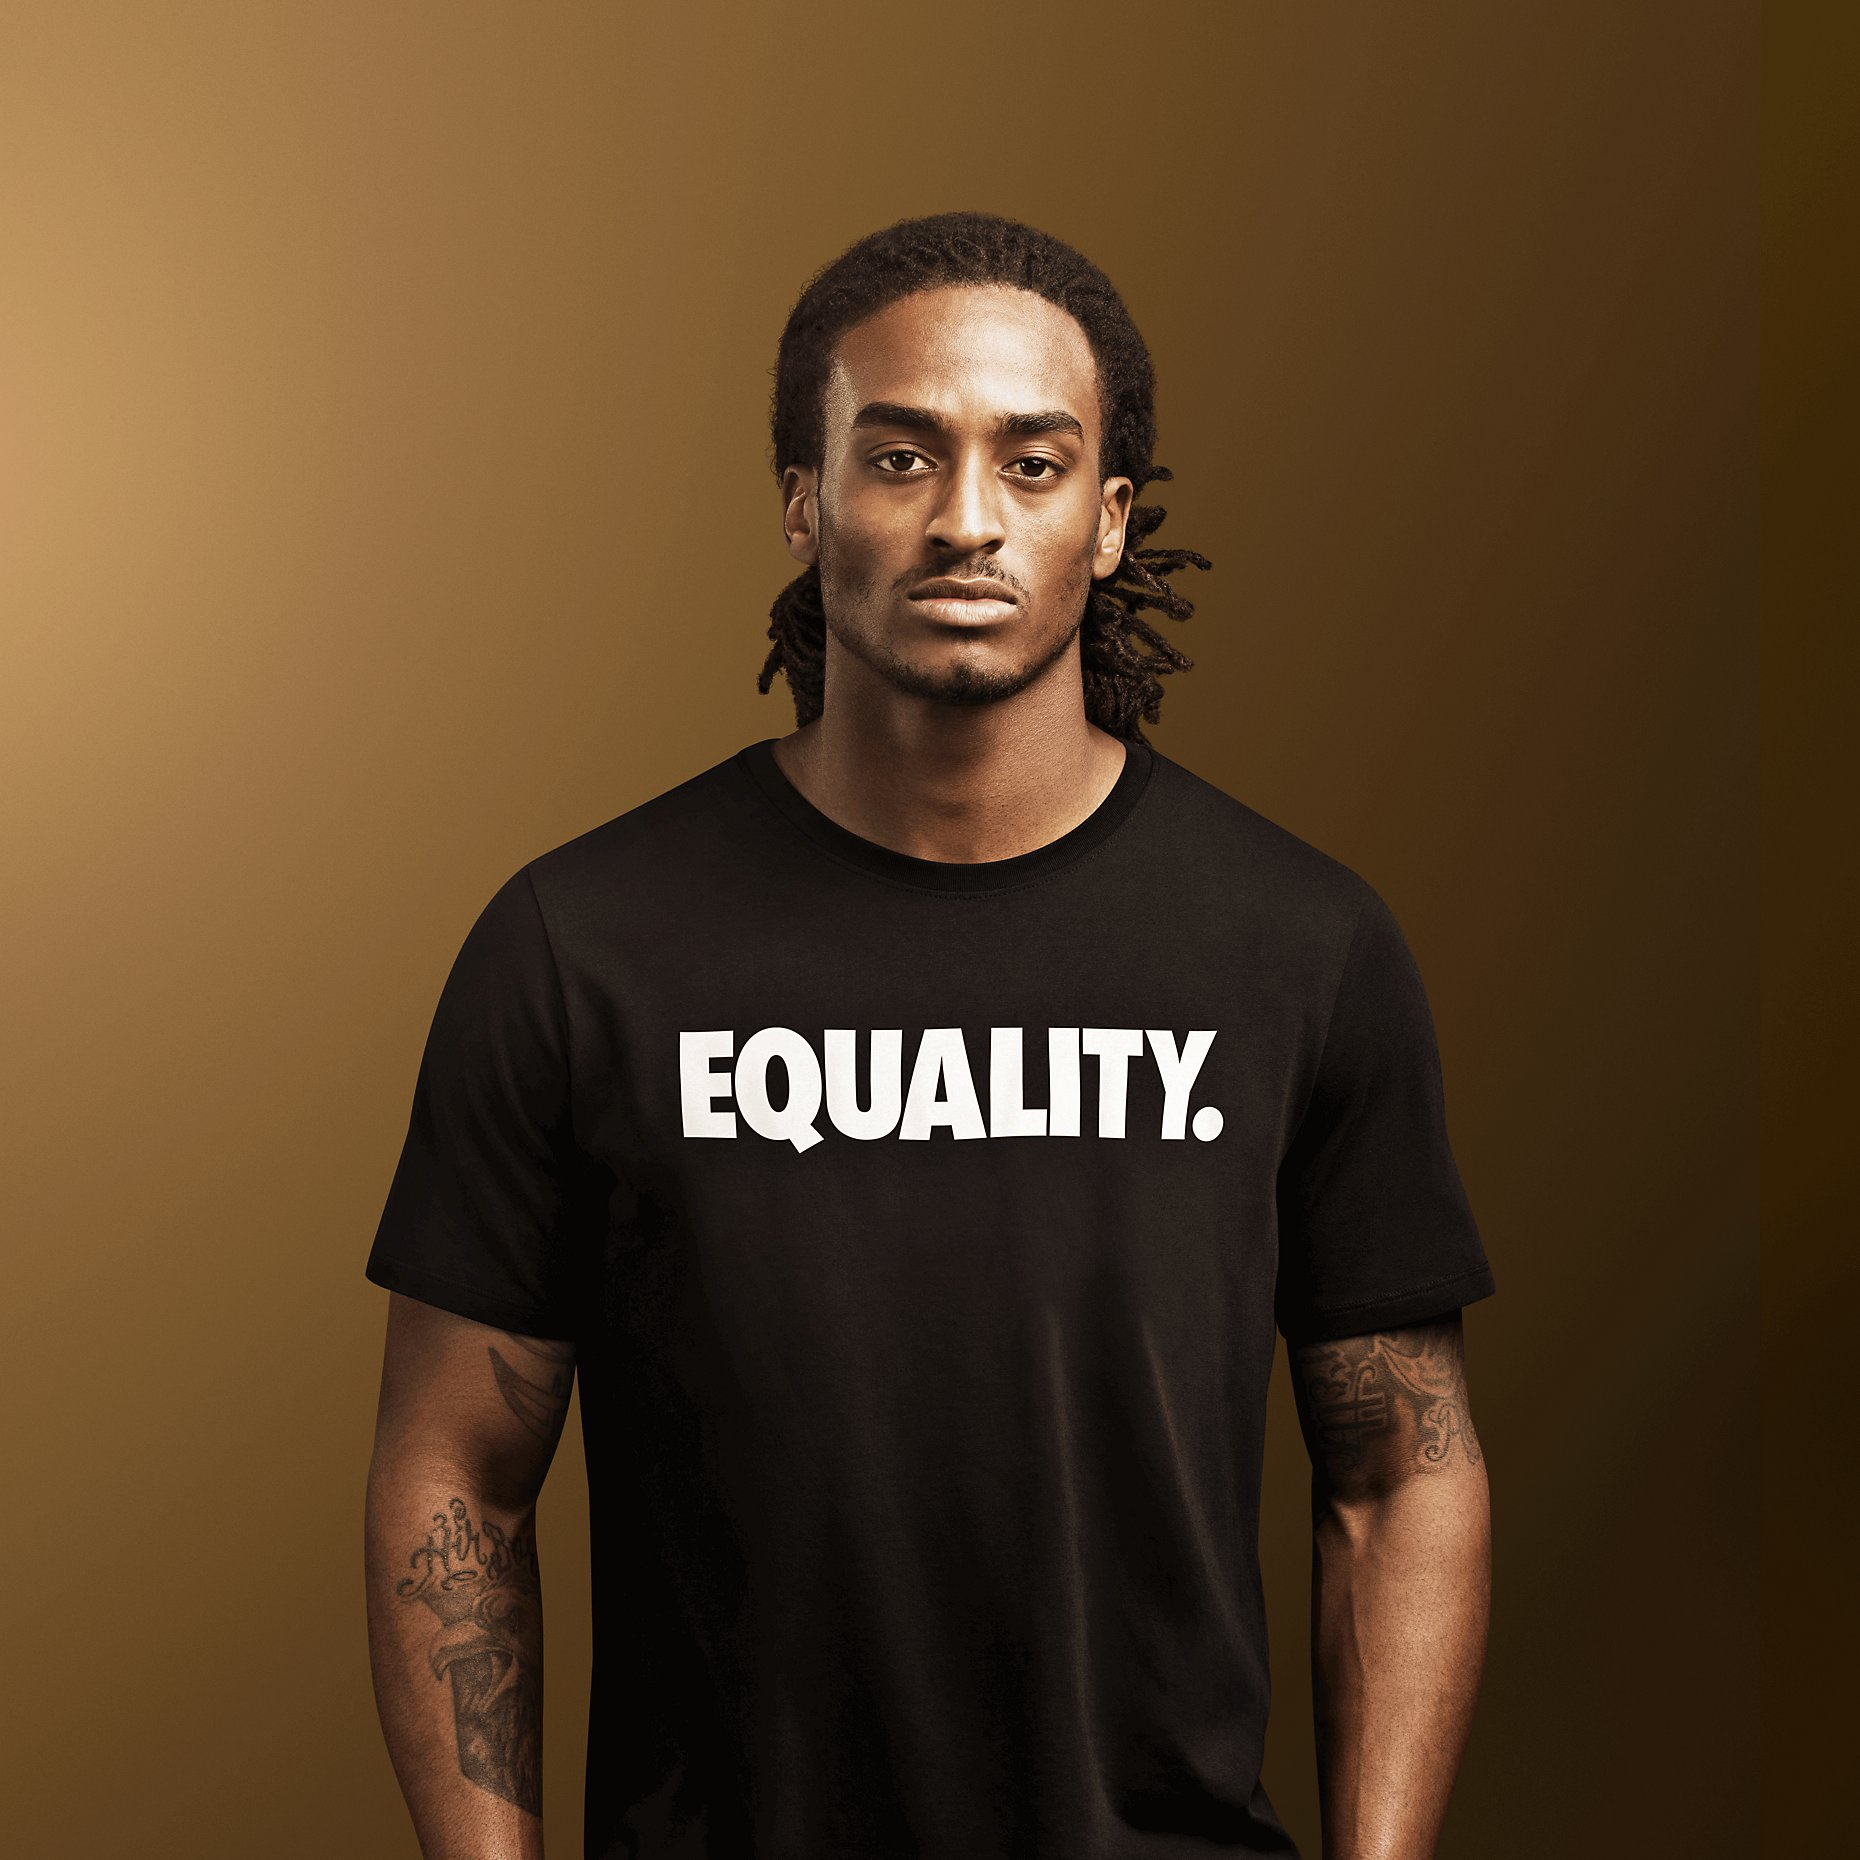 equality-mens-t-shirt.jpg